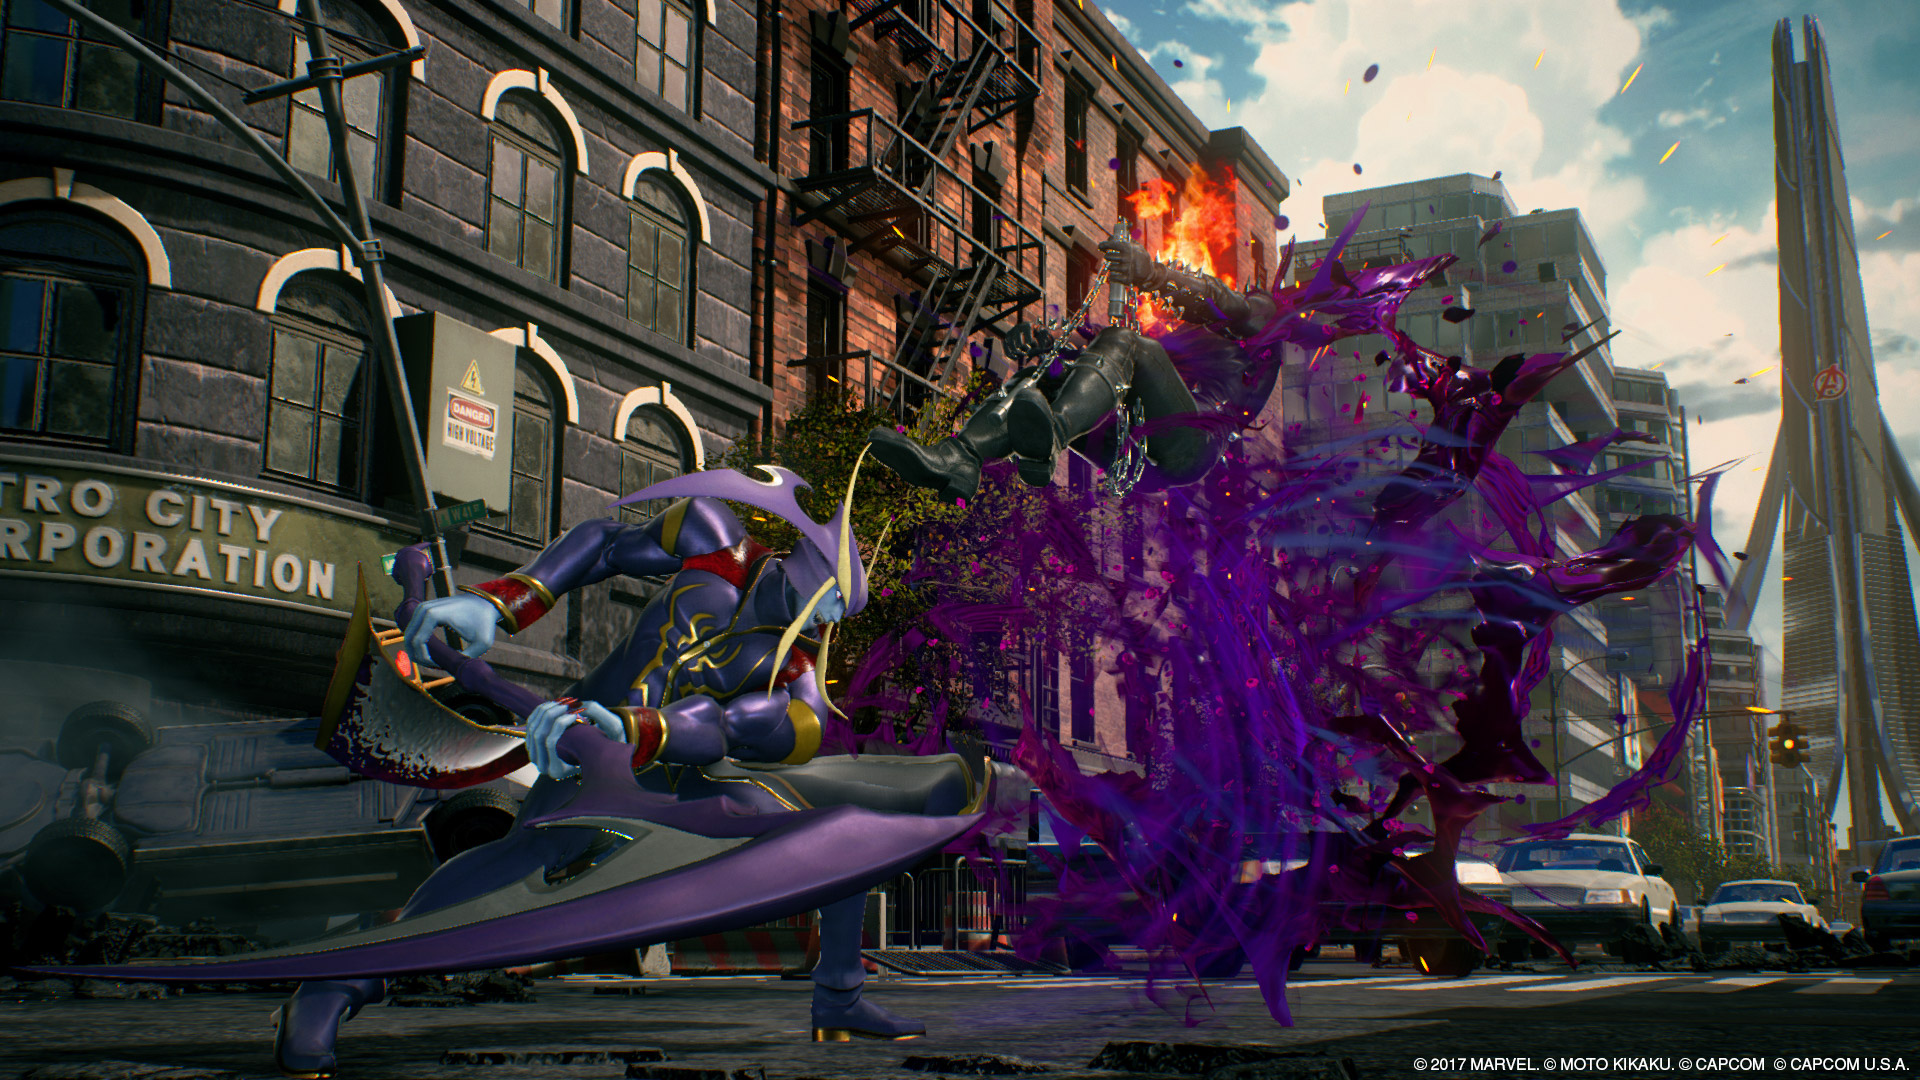 Star Wars Wallpaper Pc Hd New Marvel Vs Capcom Infinite Trailer Shows Jedah And